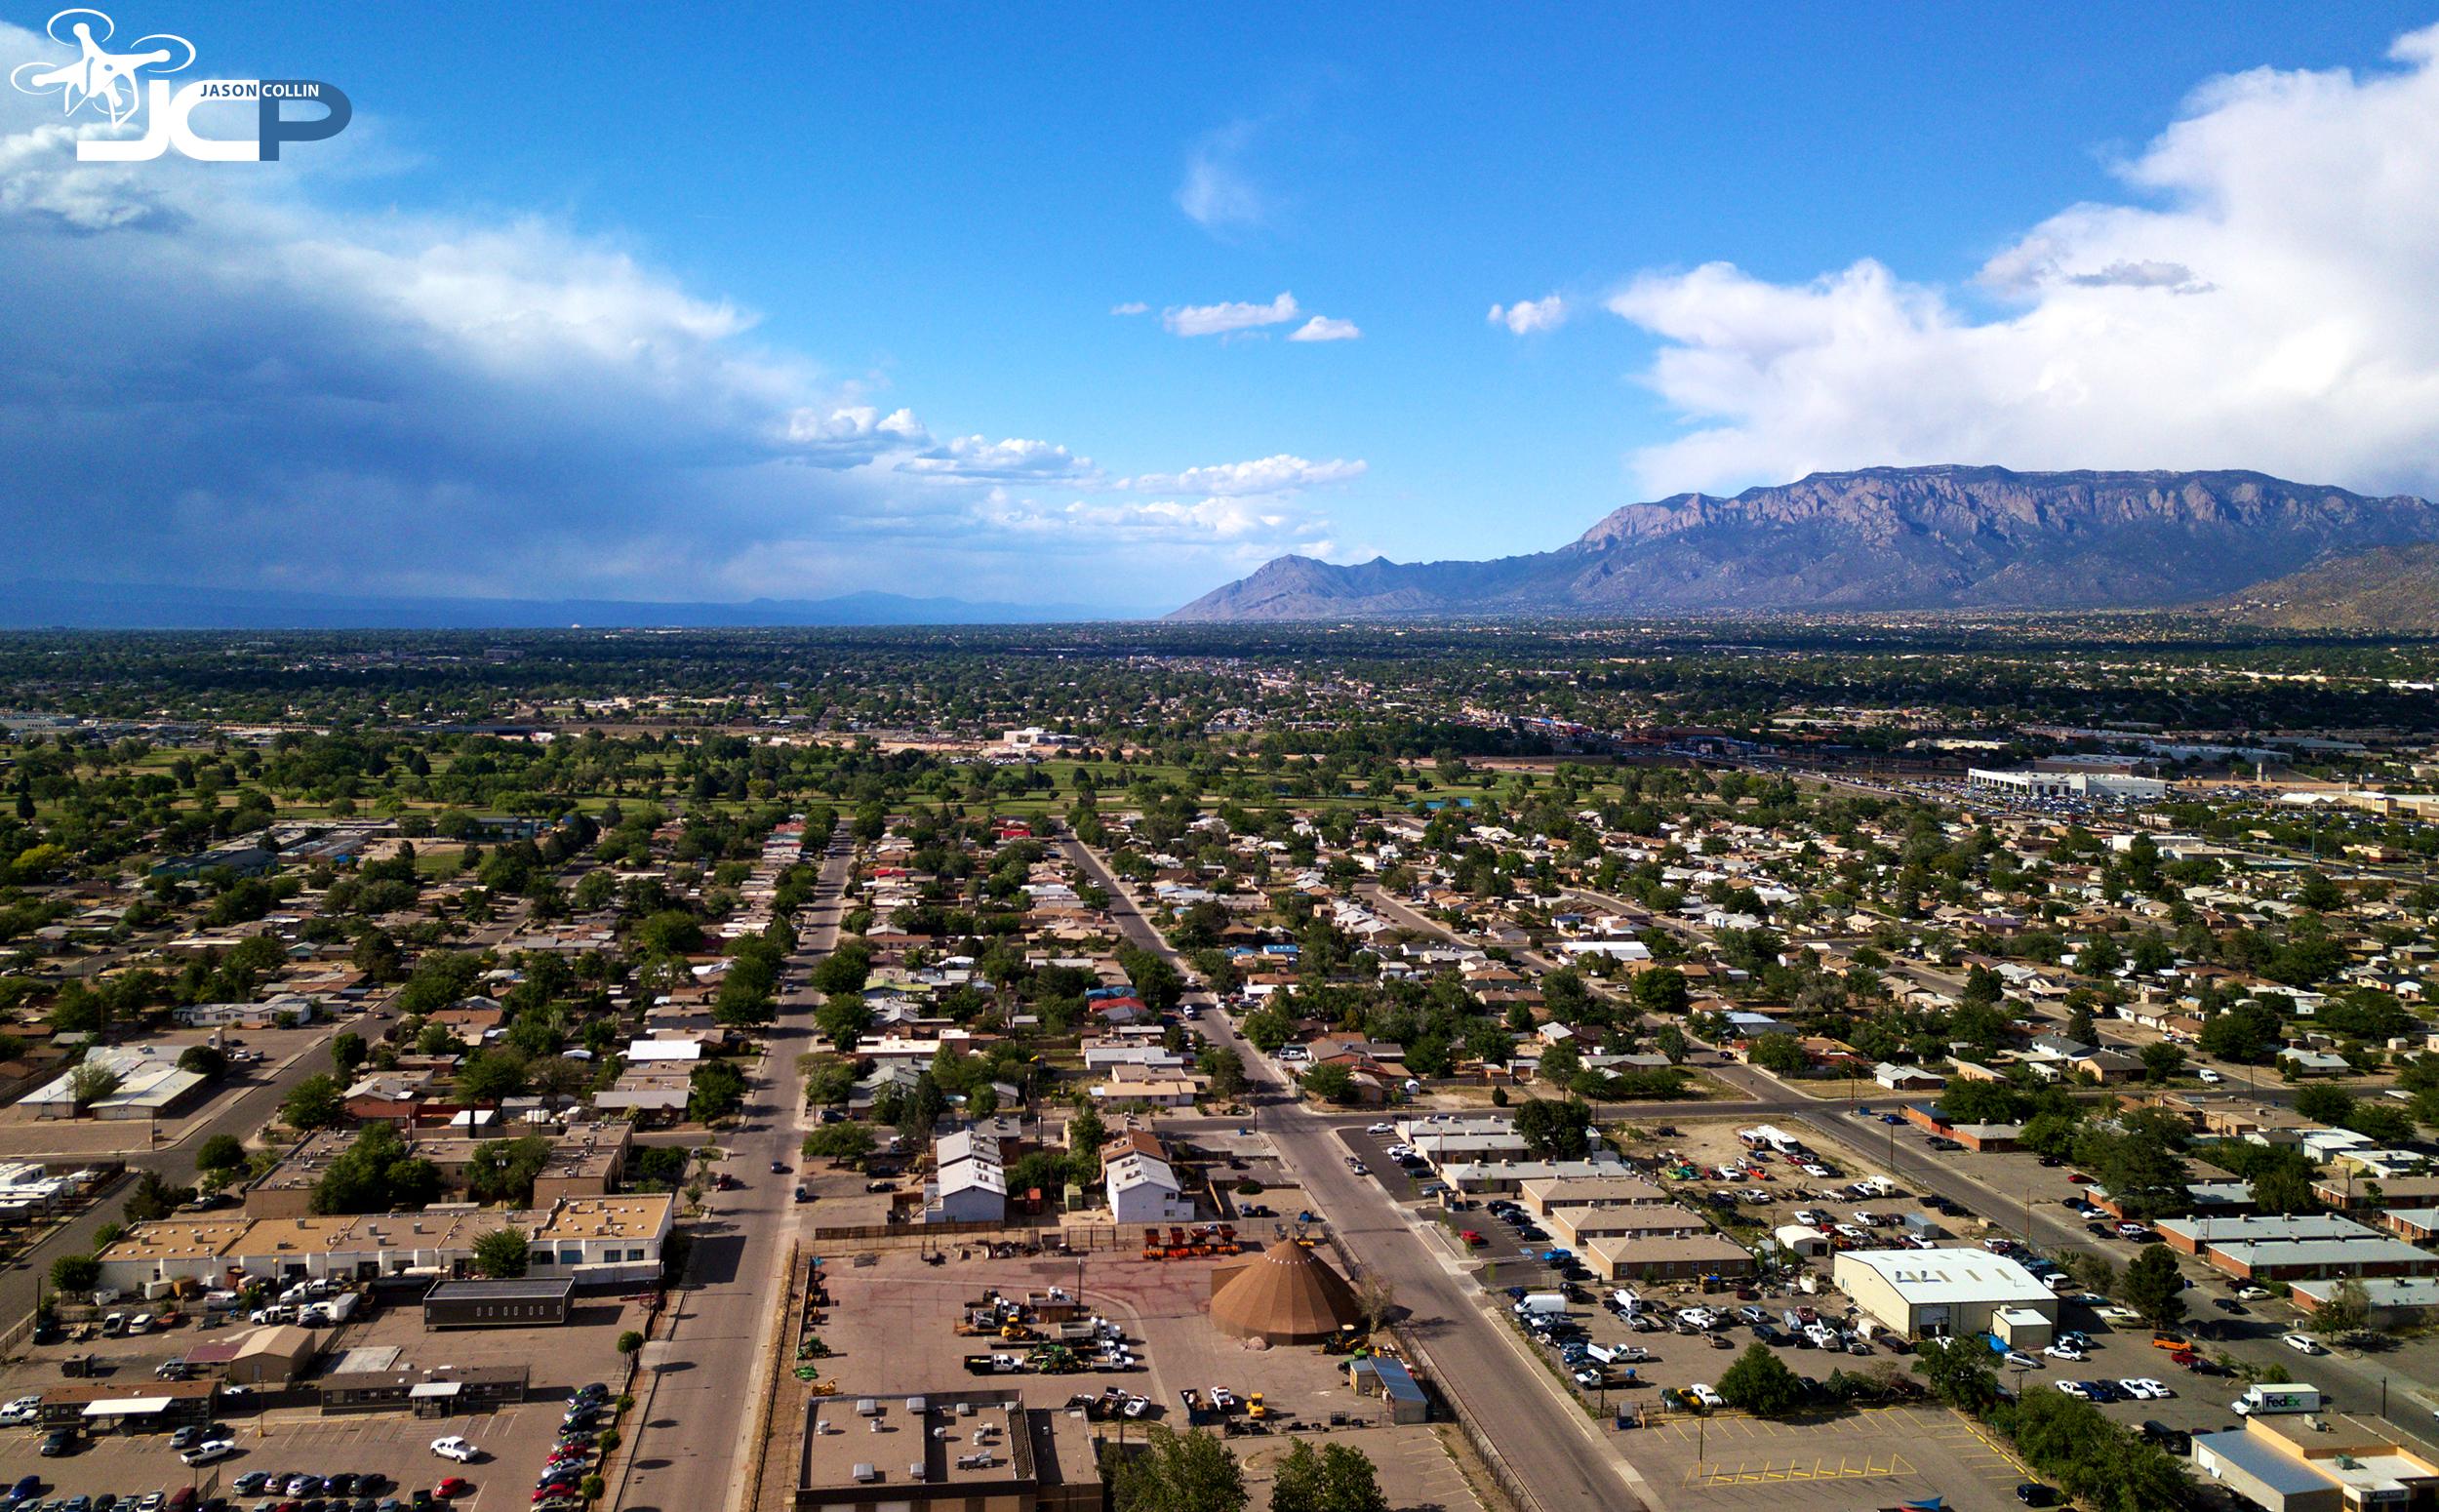 Aerial drone photo of southeast Albuquerque New Mexico